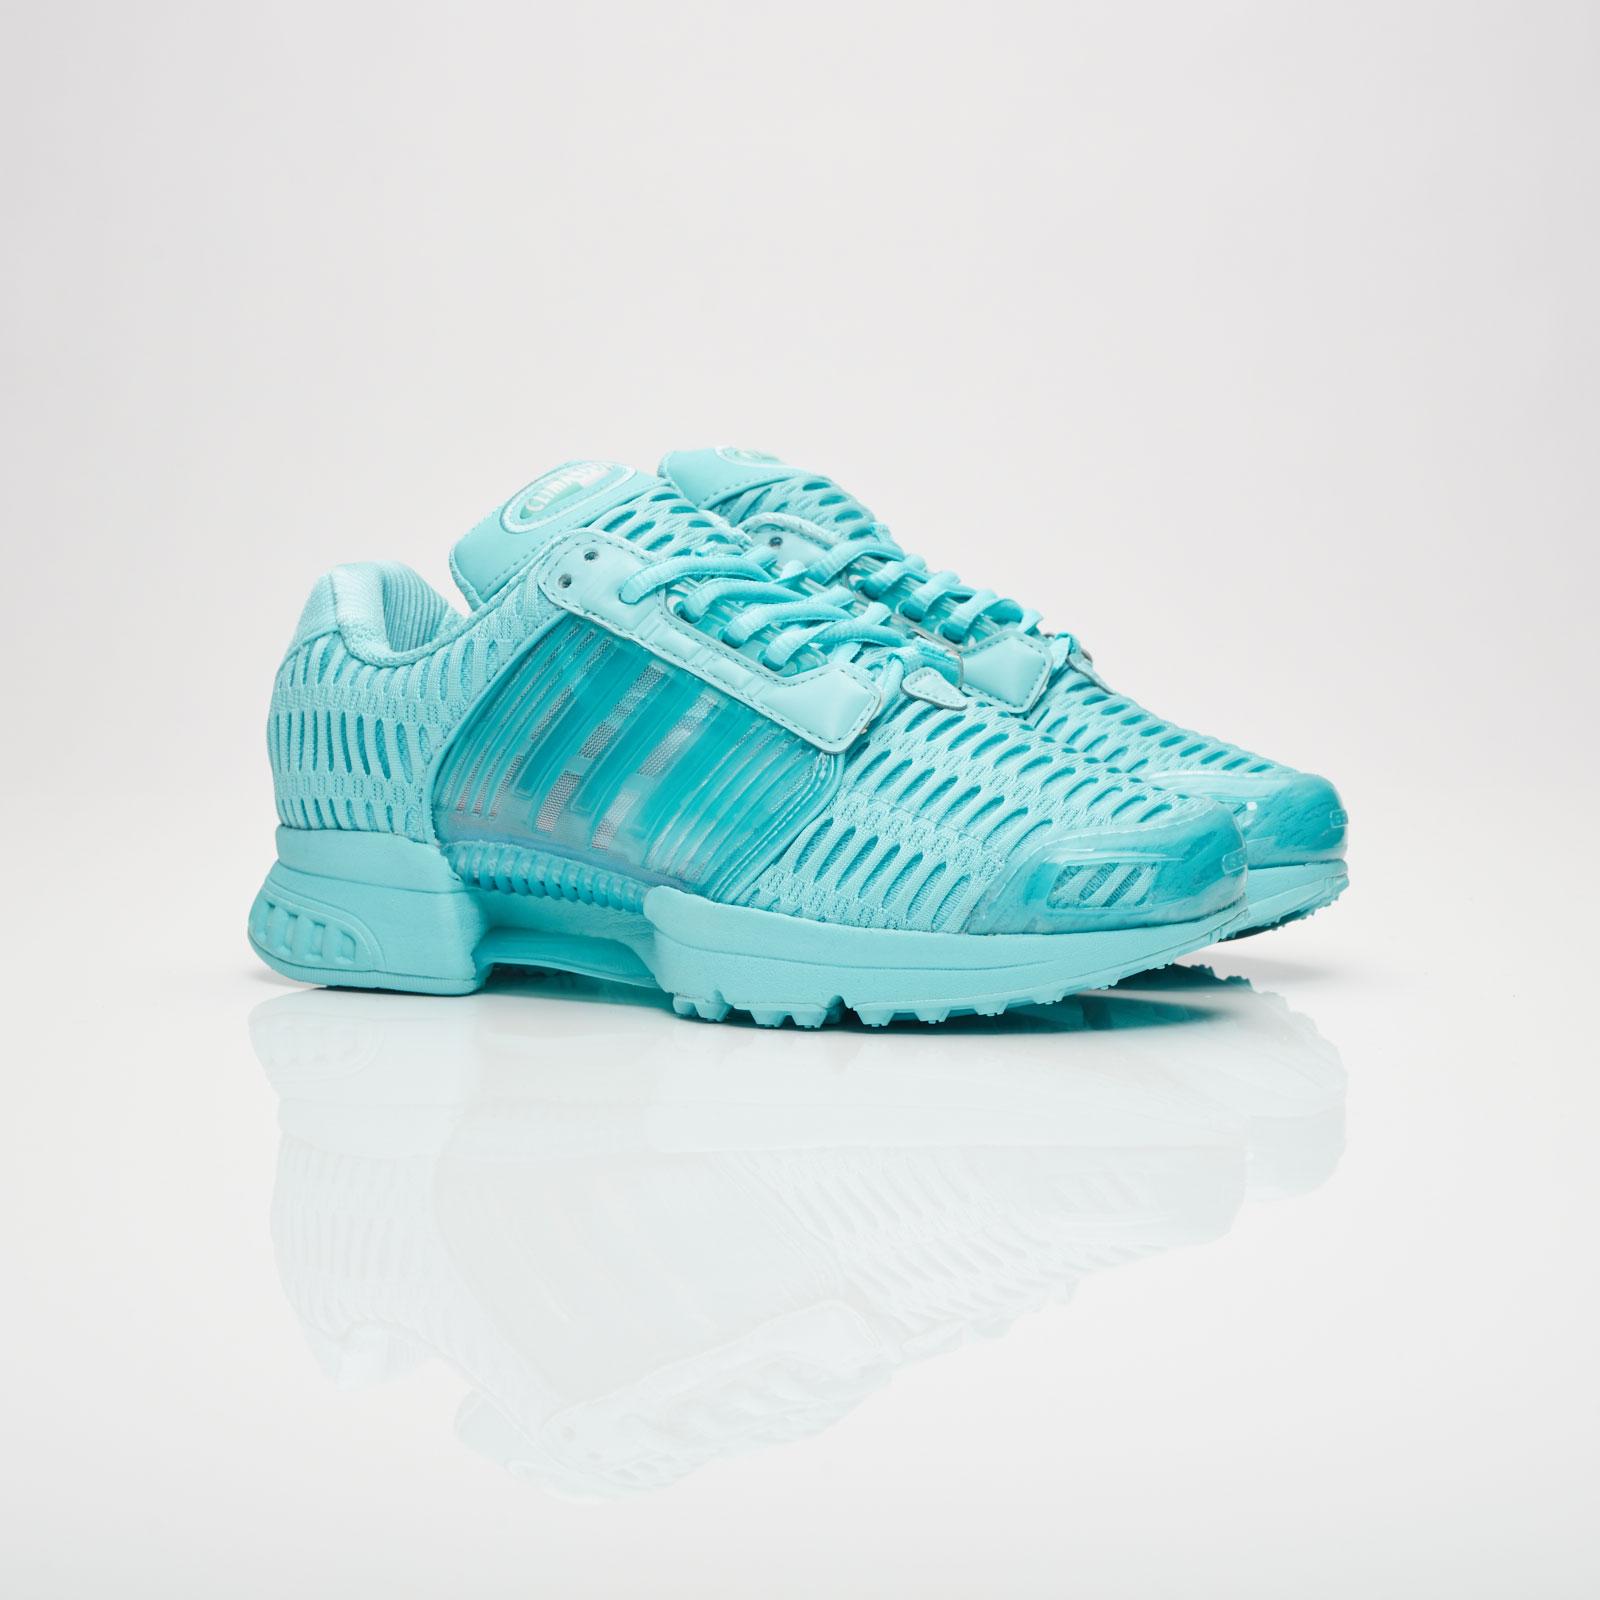 adidas Climacool 1 W - Bb5308 - SNS | sneakers & streetwear online ...